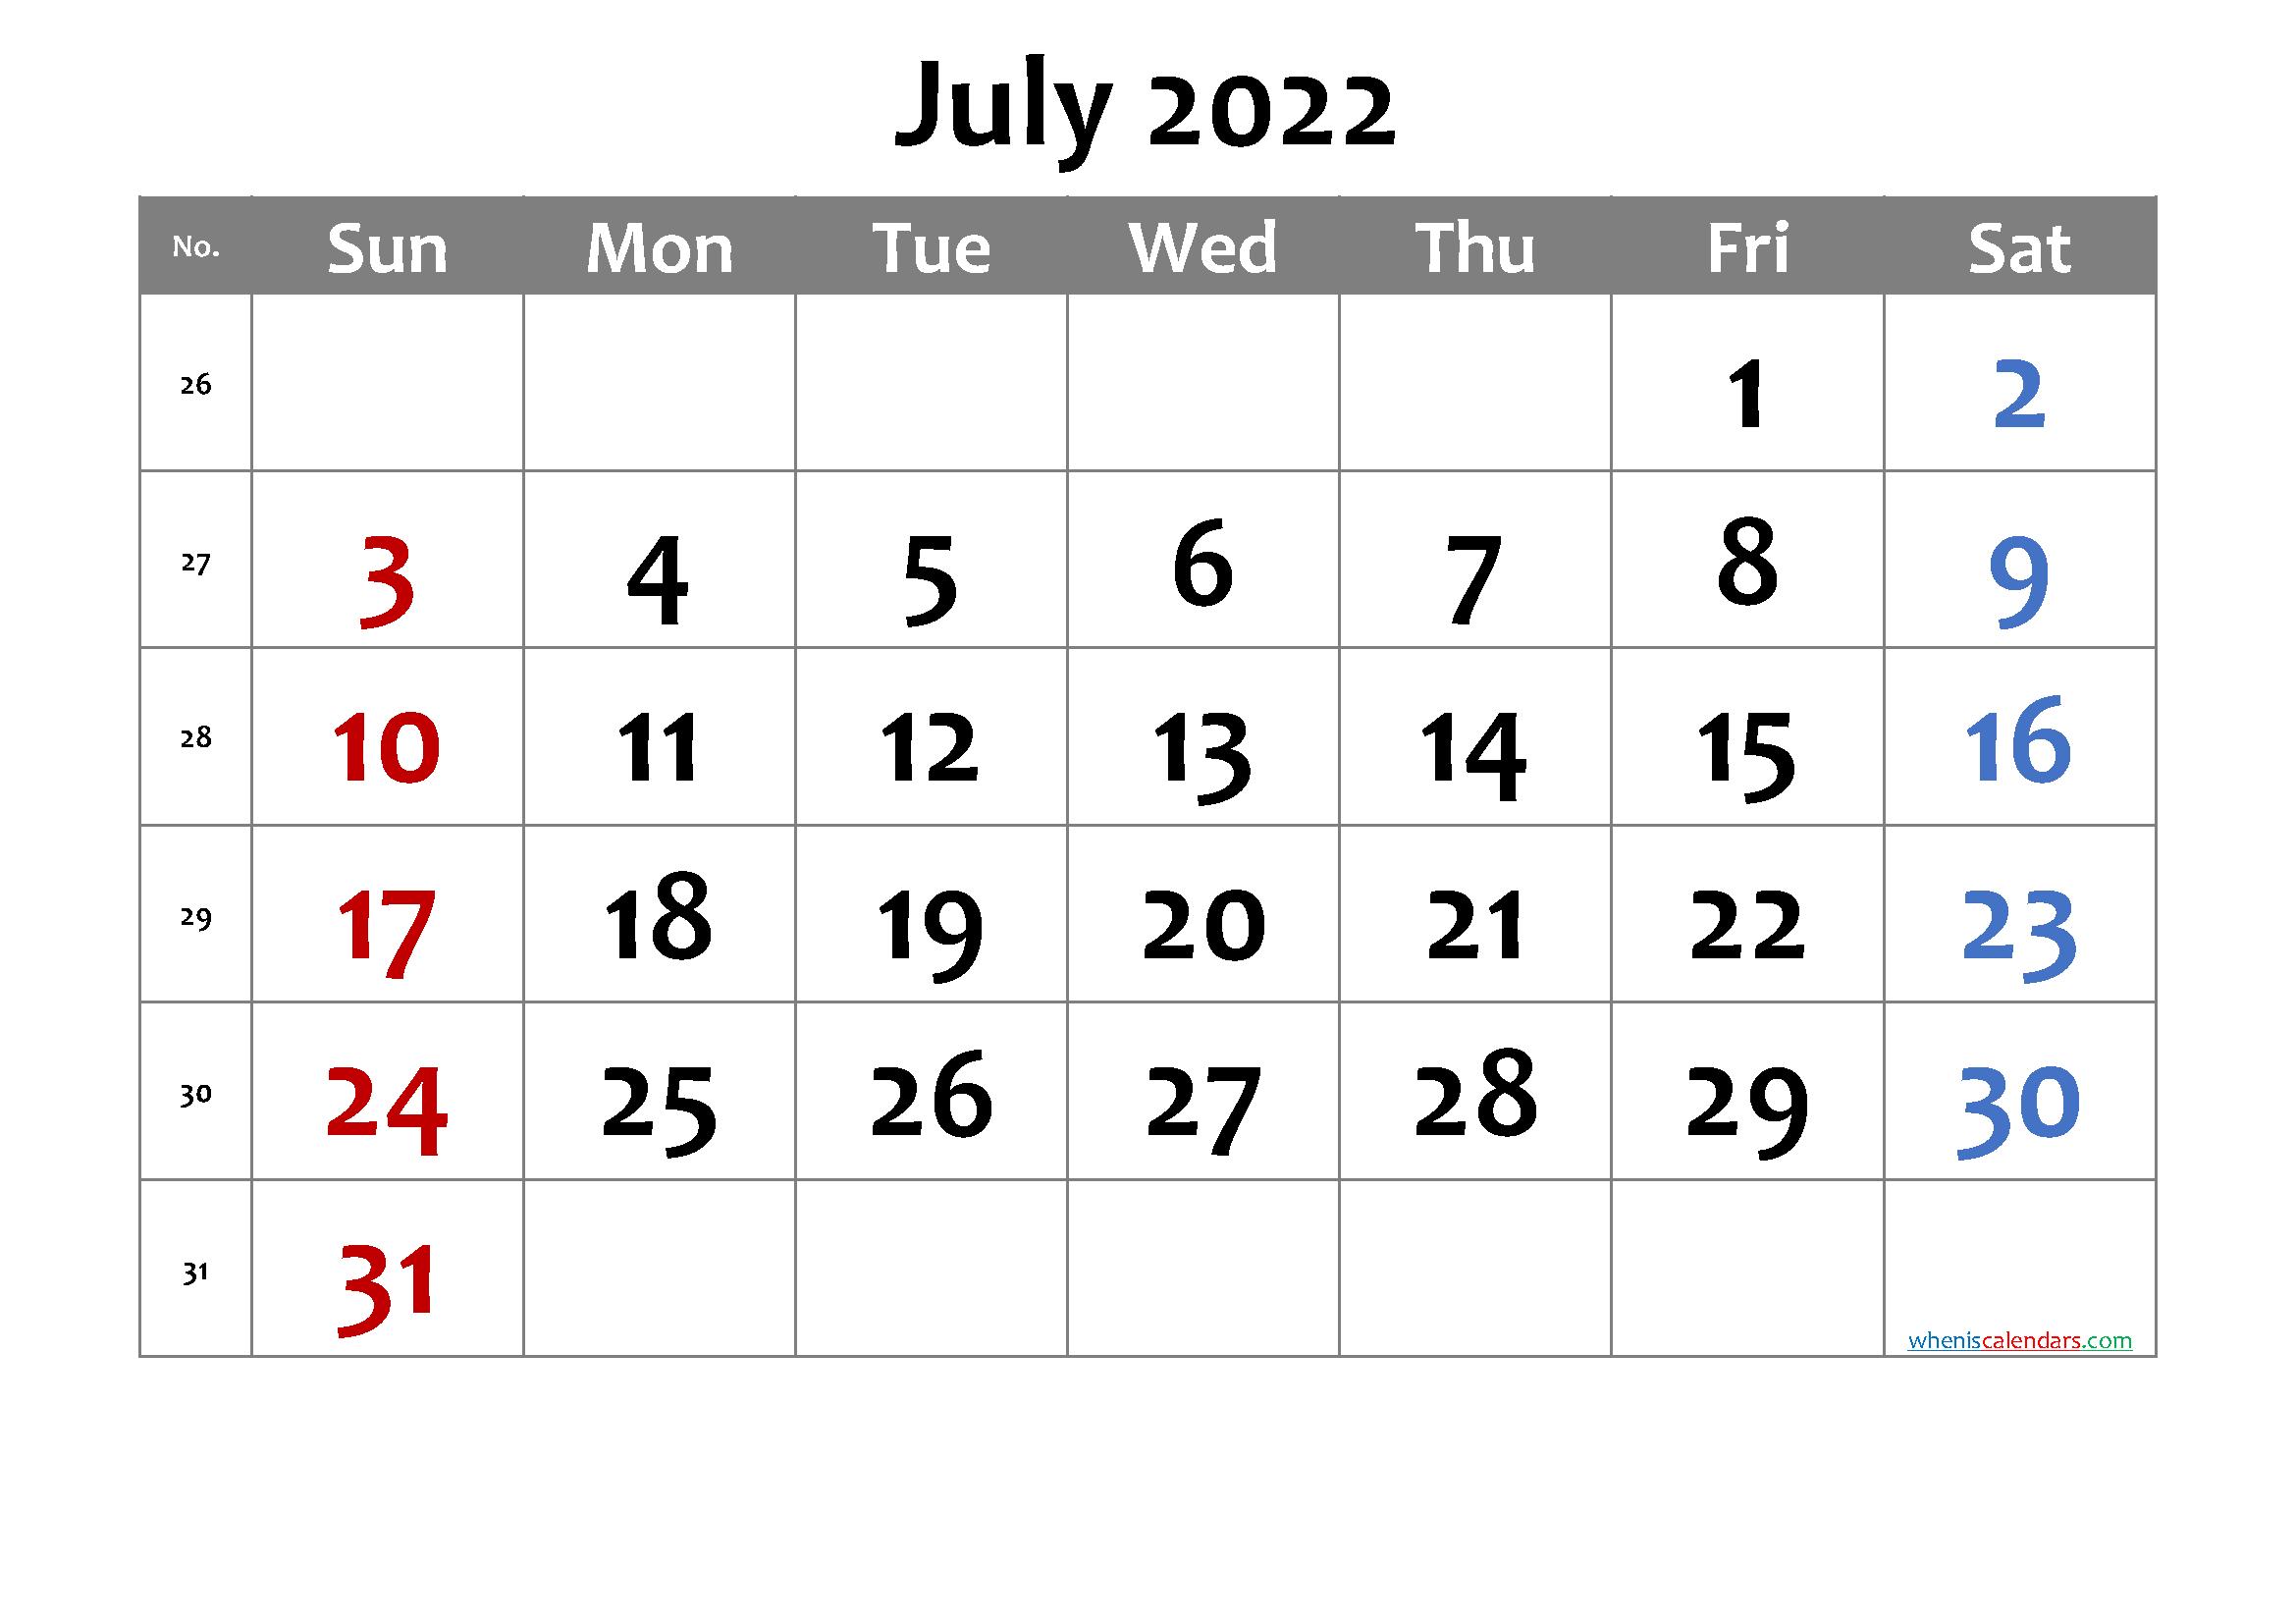 Printable Calendar July 2022.Free Printable July 2022 Calendar 6 Templates Printable Calendar Template Printable Calendar July Calendar Printables